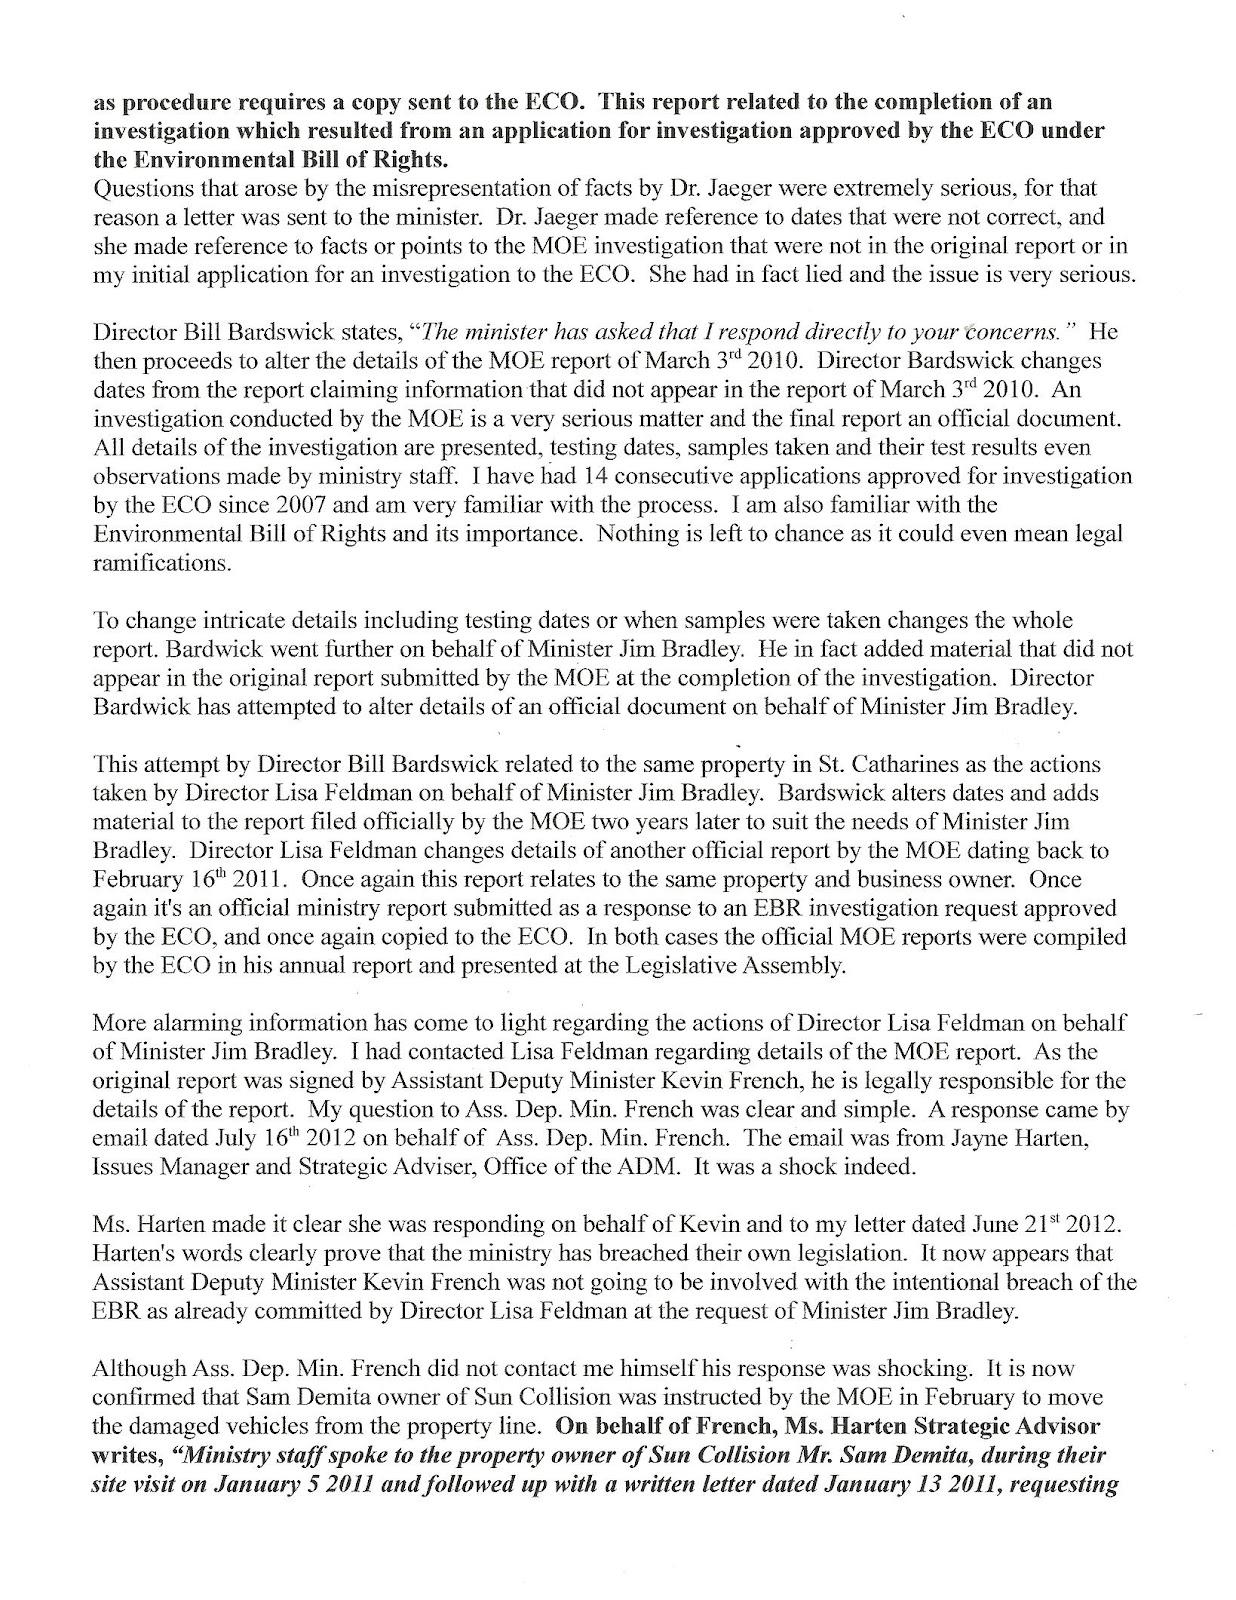 016 Ombudsmanletter2 Essay Example National Honor Society Sensational Application Examples Service Junior Scholarship Full